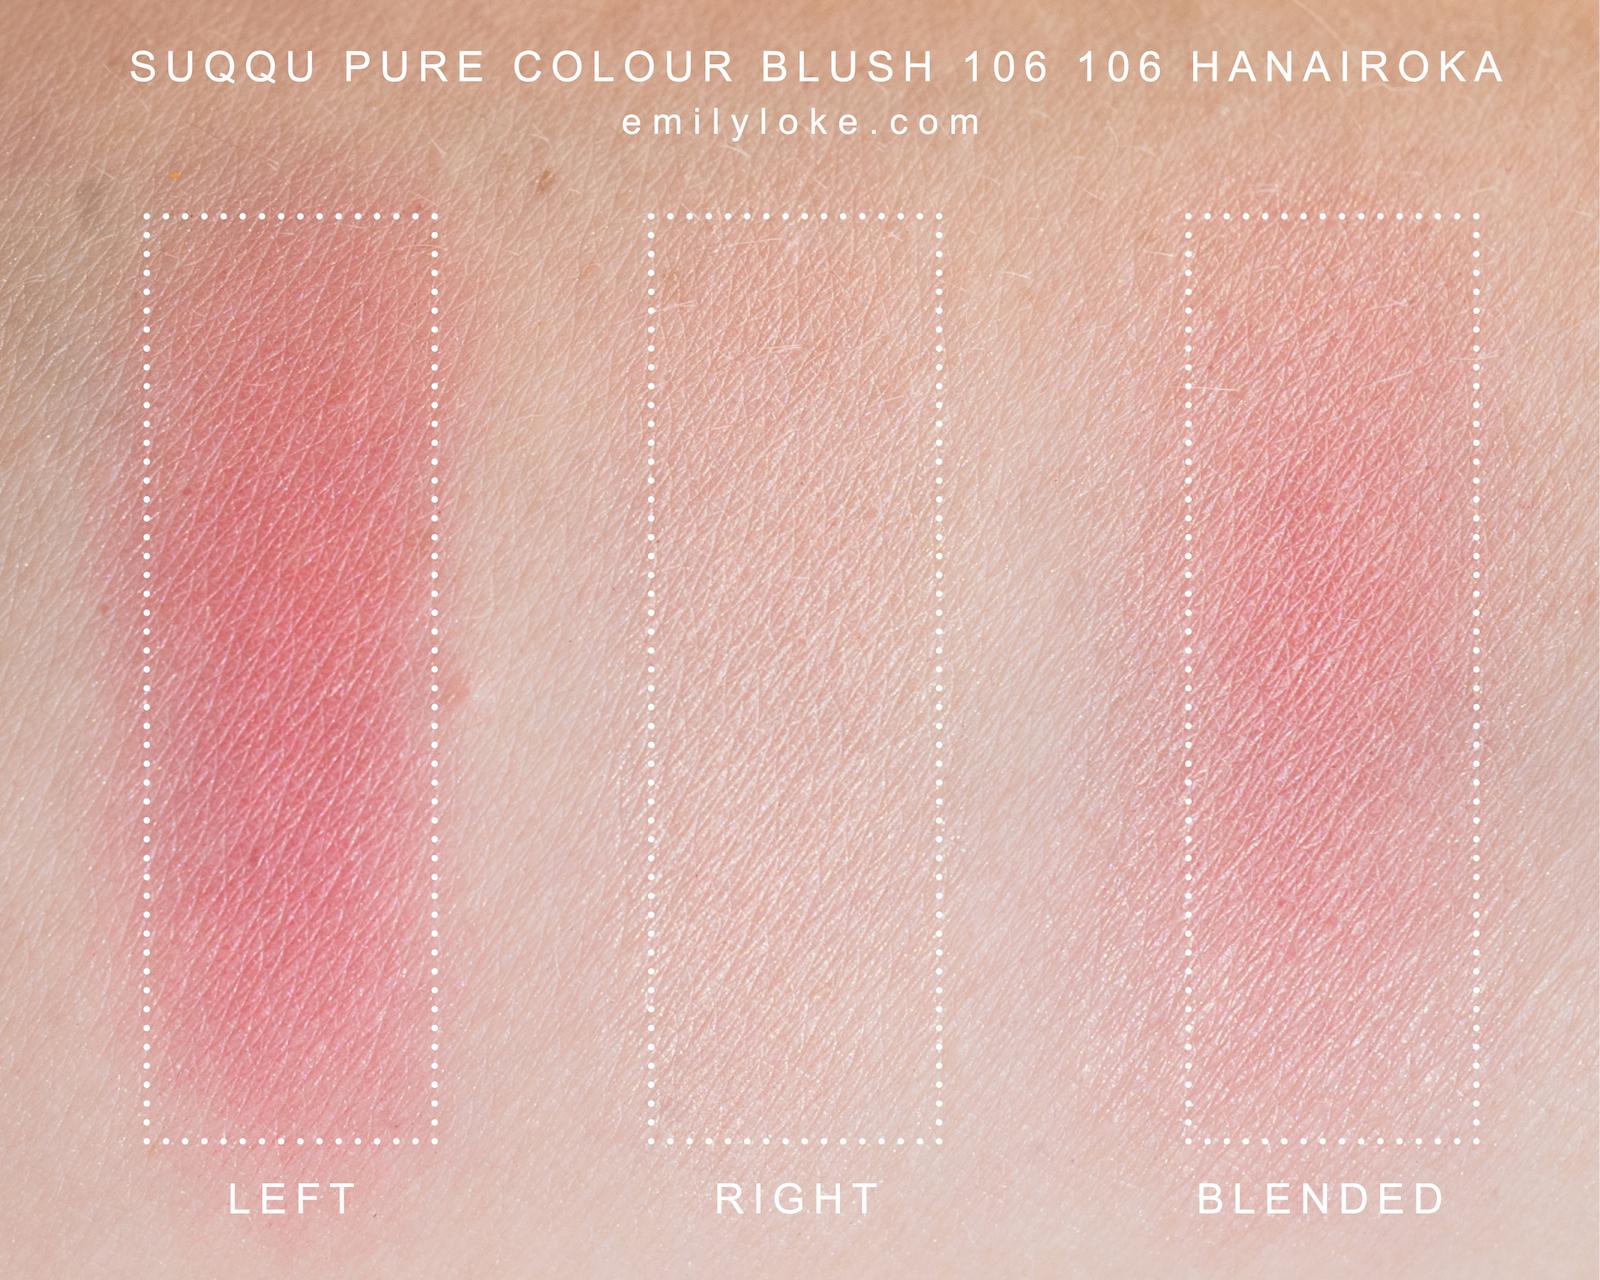 suqqu pure colour blush 106 106 Hanairoka